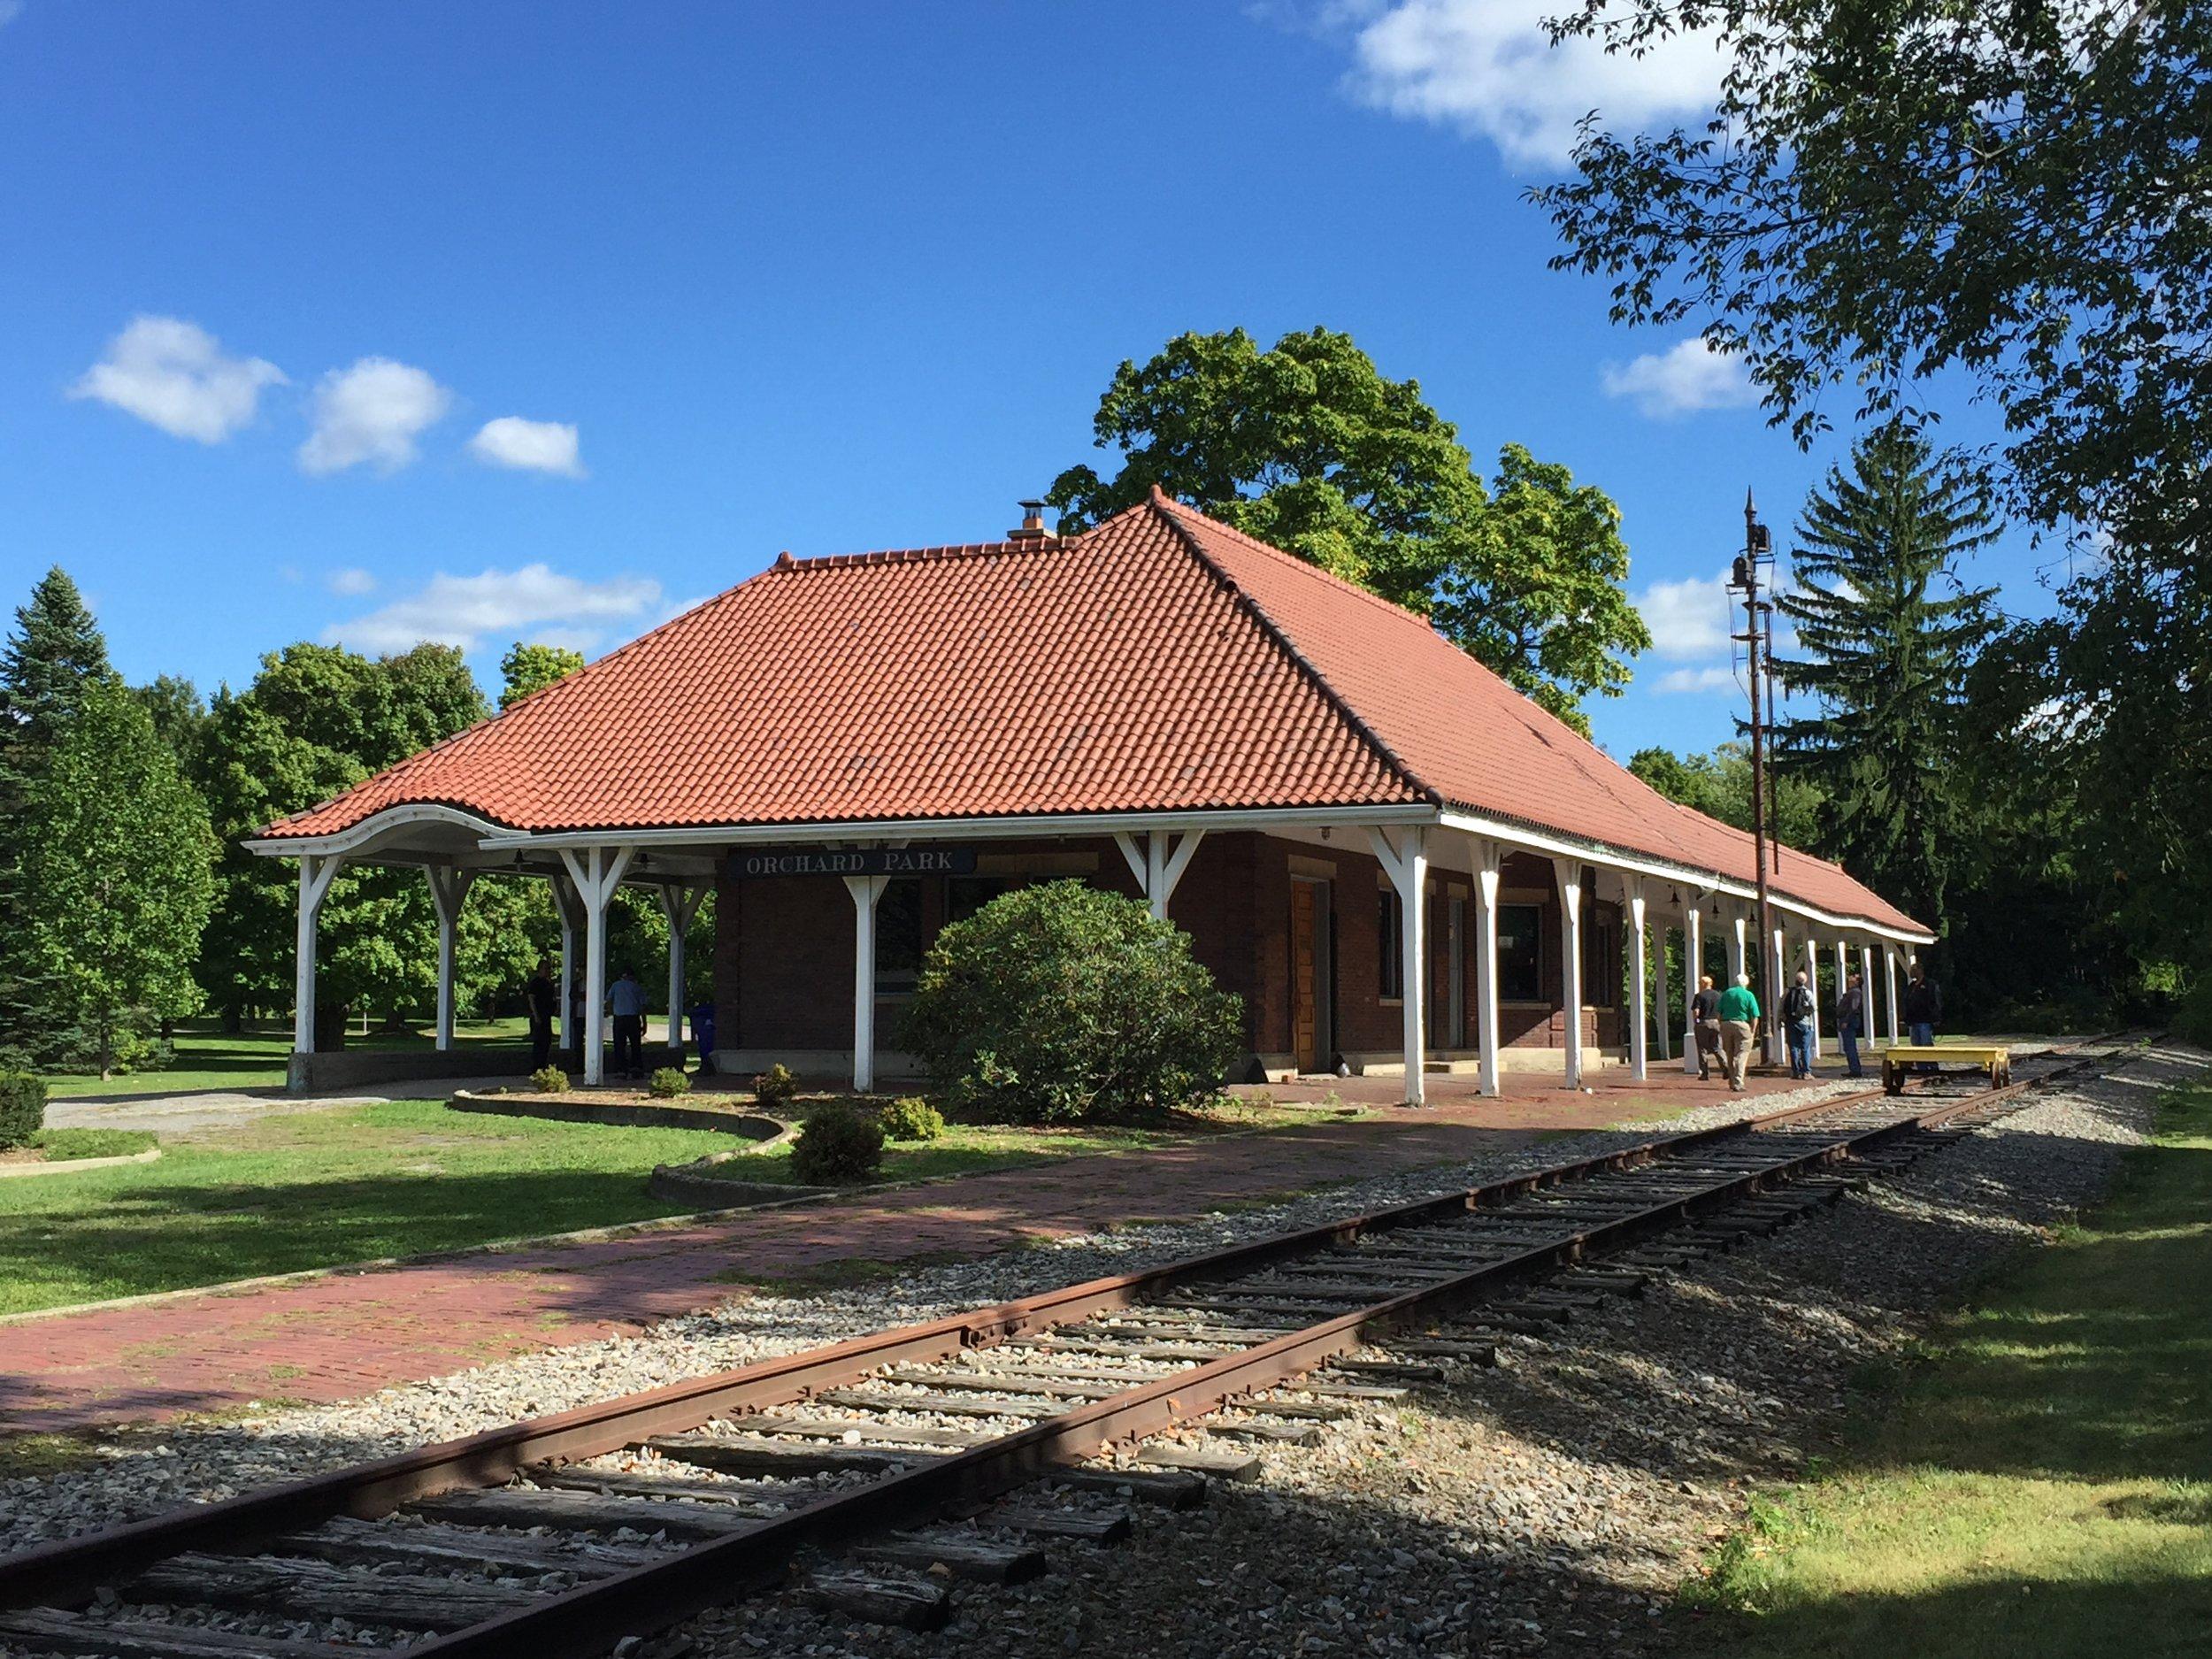 Western New York Railway Historical Society's ex-B&O depot in Orchard Park, NY